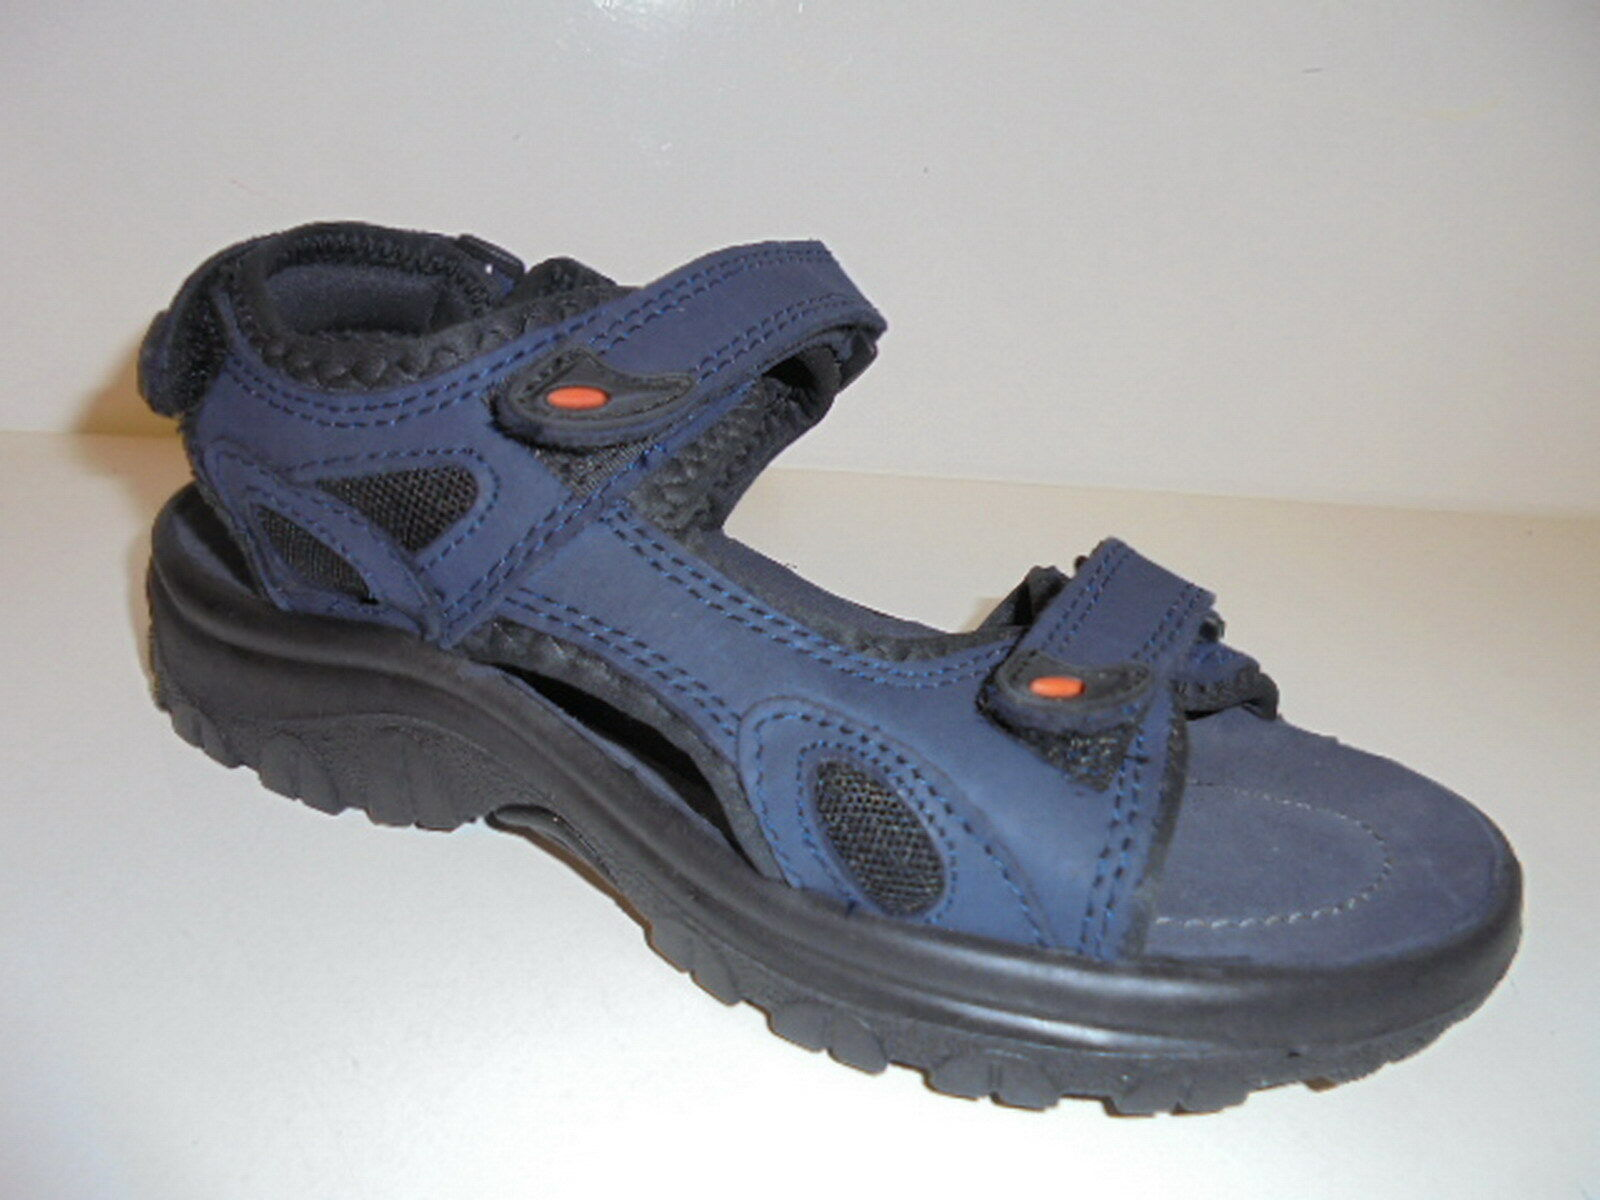 2steps  Damenschuhe Sandale Treckingsandale Freizeit blau Gr. 41 Art.515010